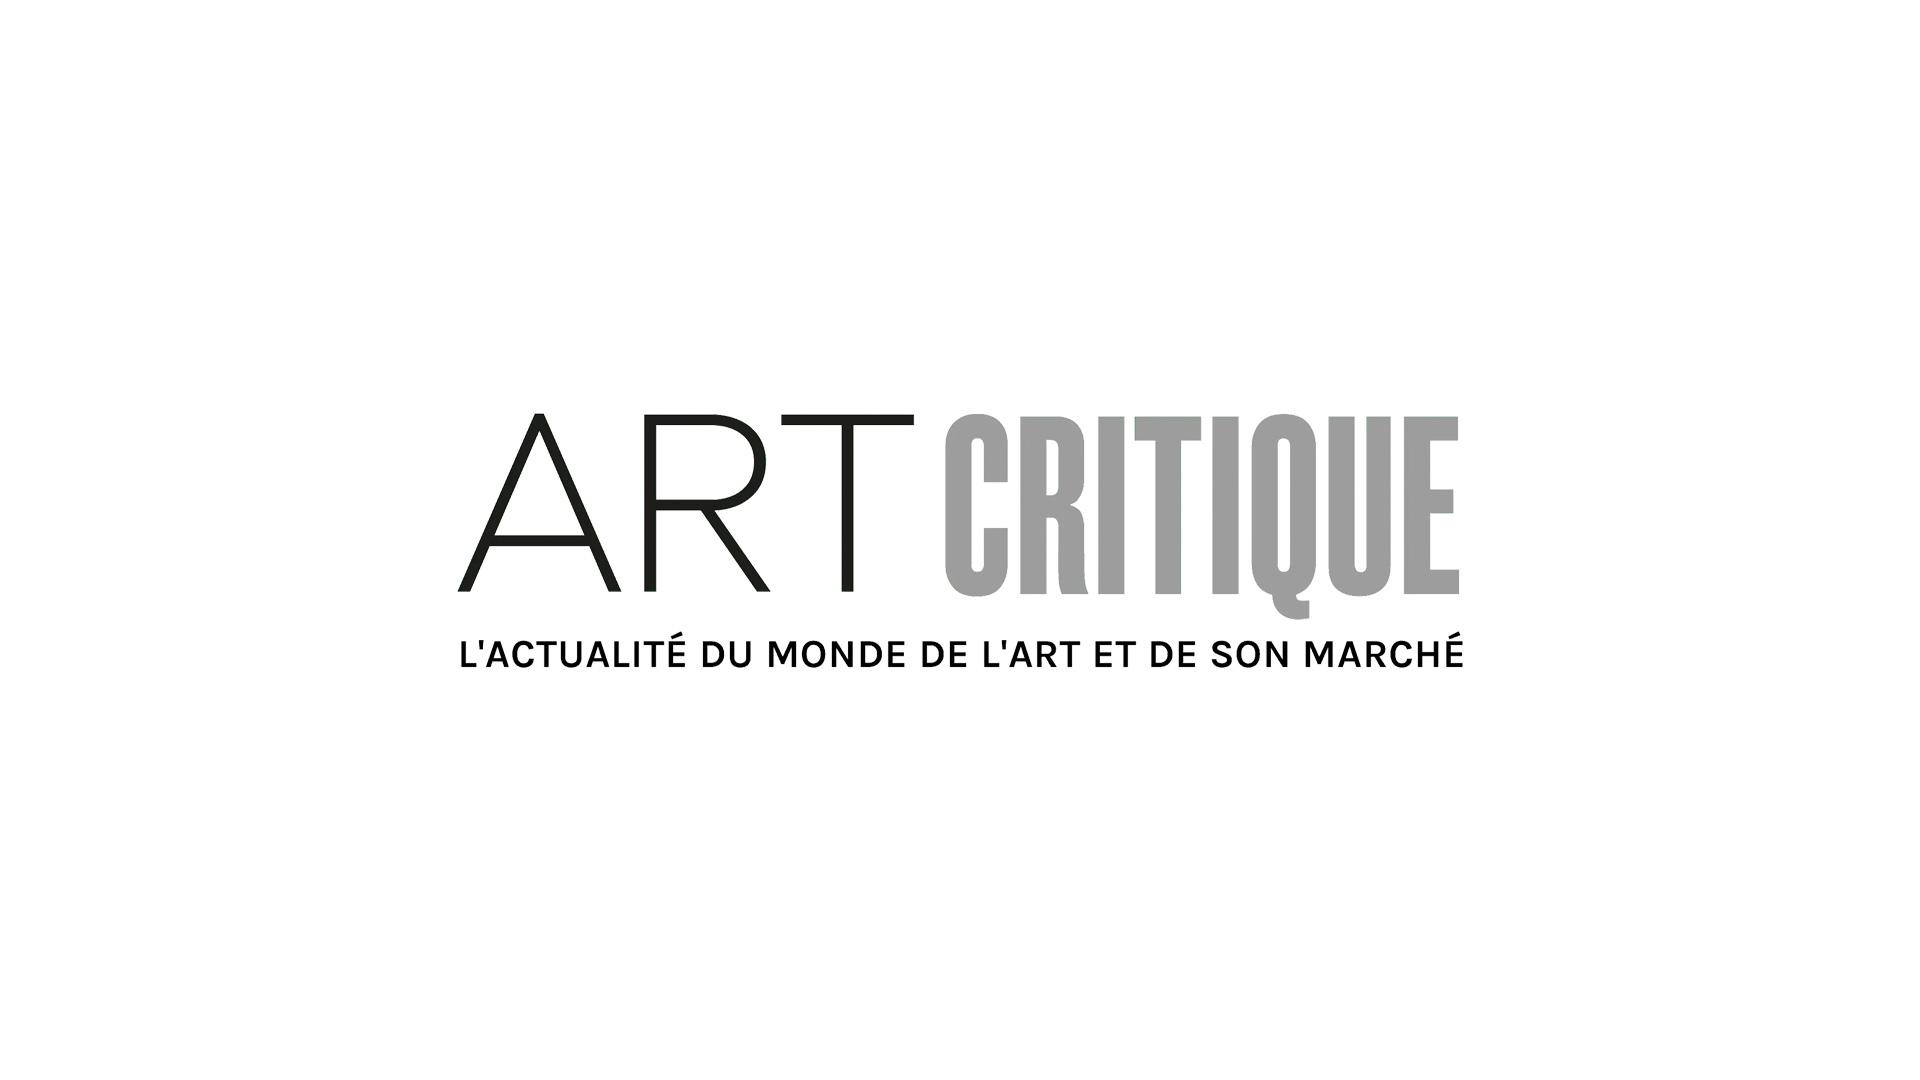 '100% Women' will feature women only in a year-long programme at Richard Saltoun Gallery